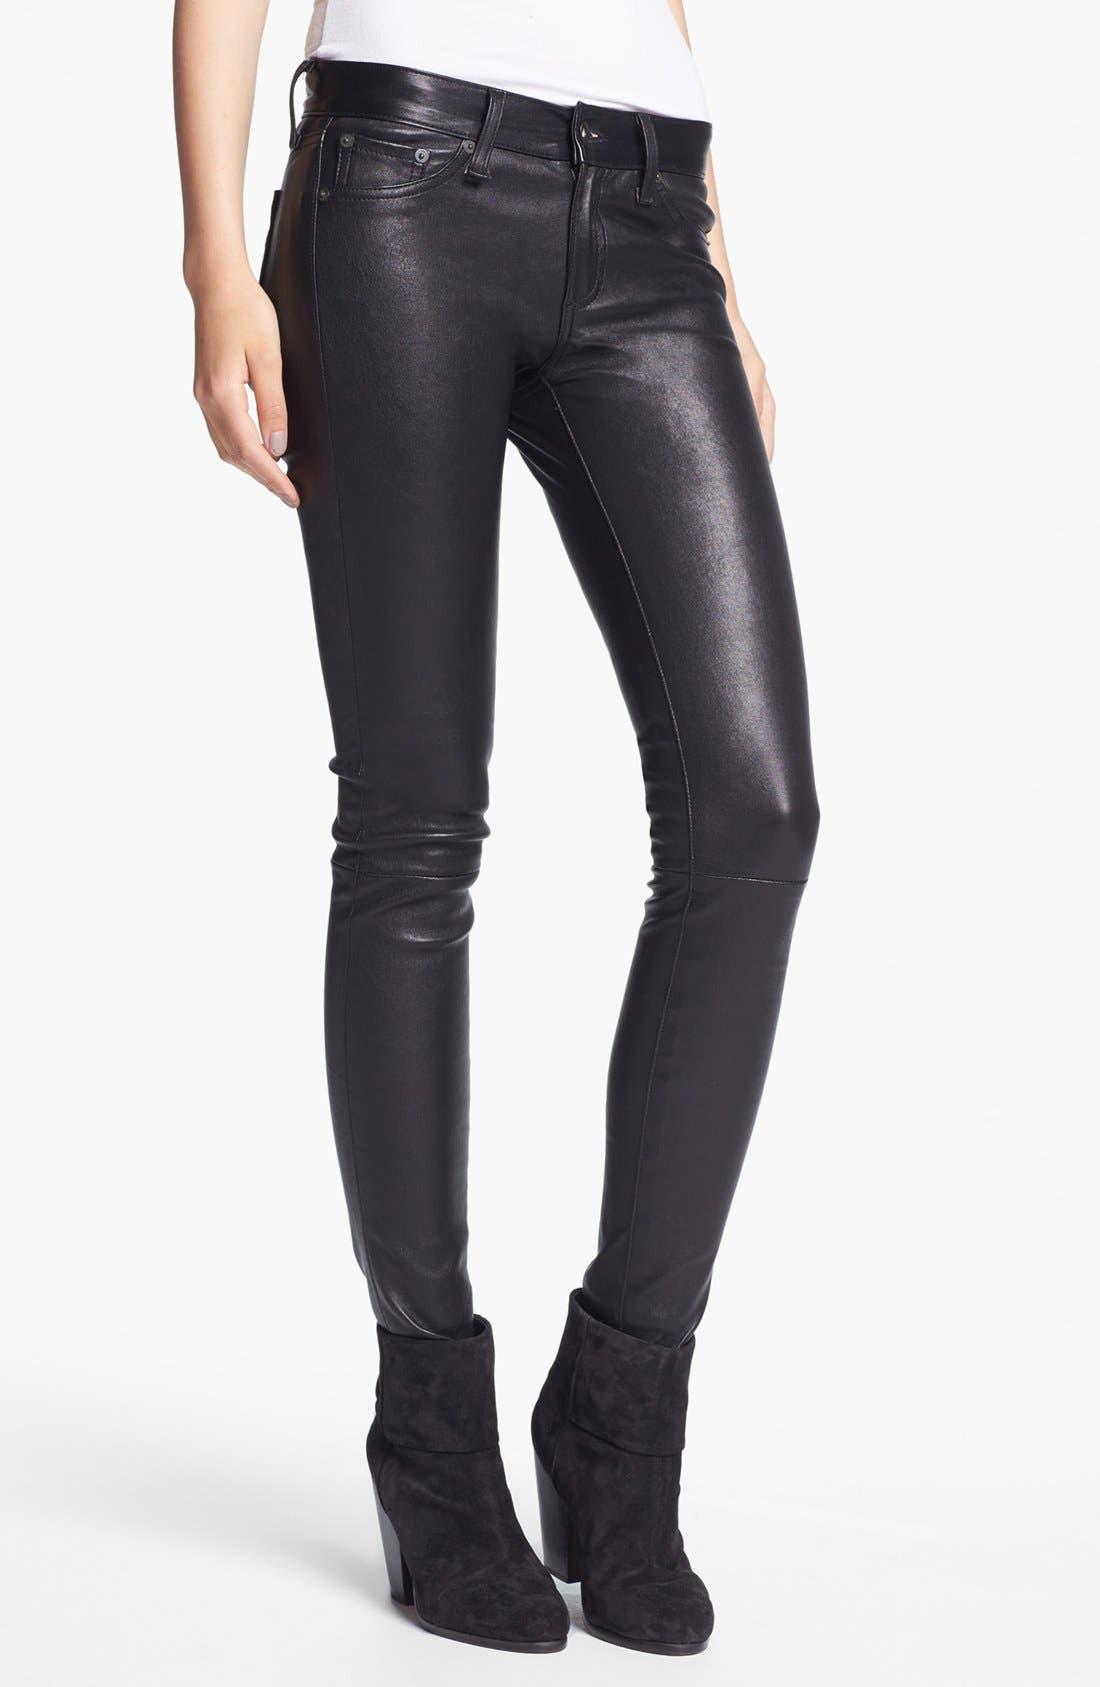 Alternate Image 1 Selected - rag & bone 'The Leather Skinny' Pants